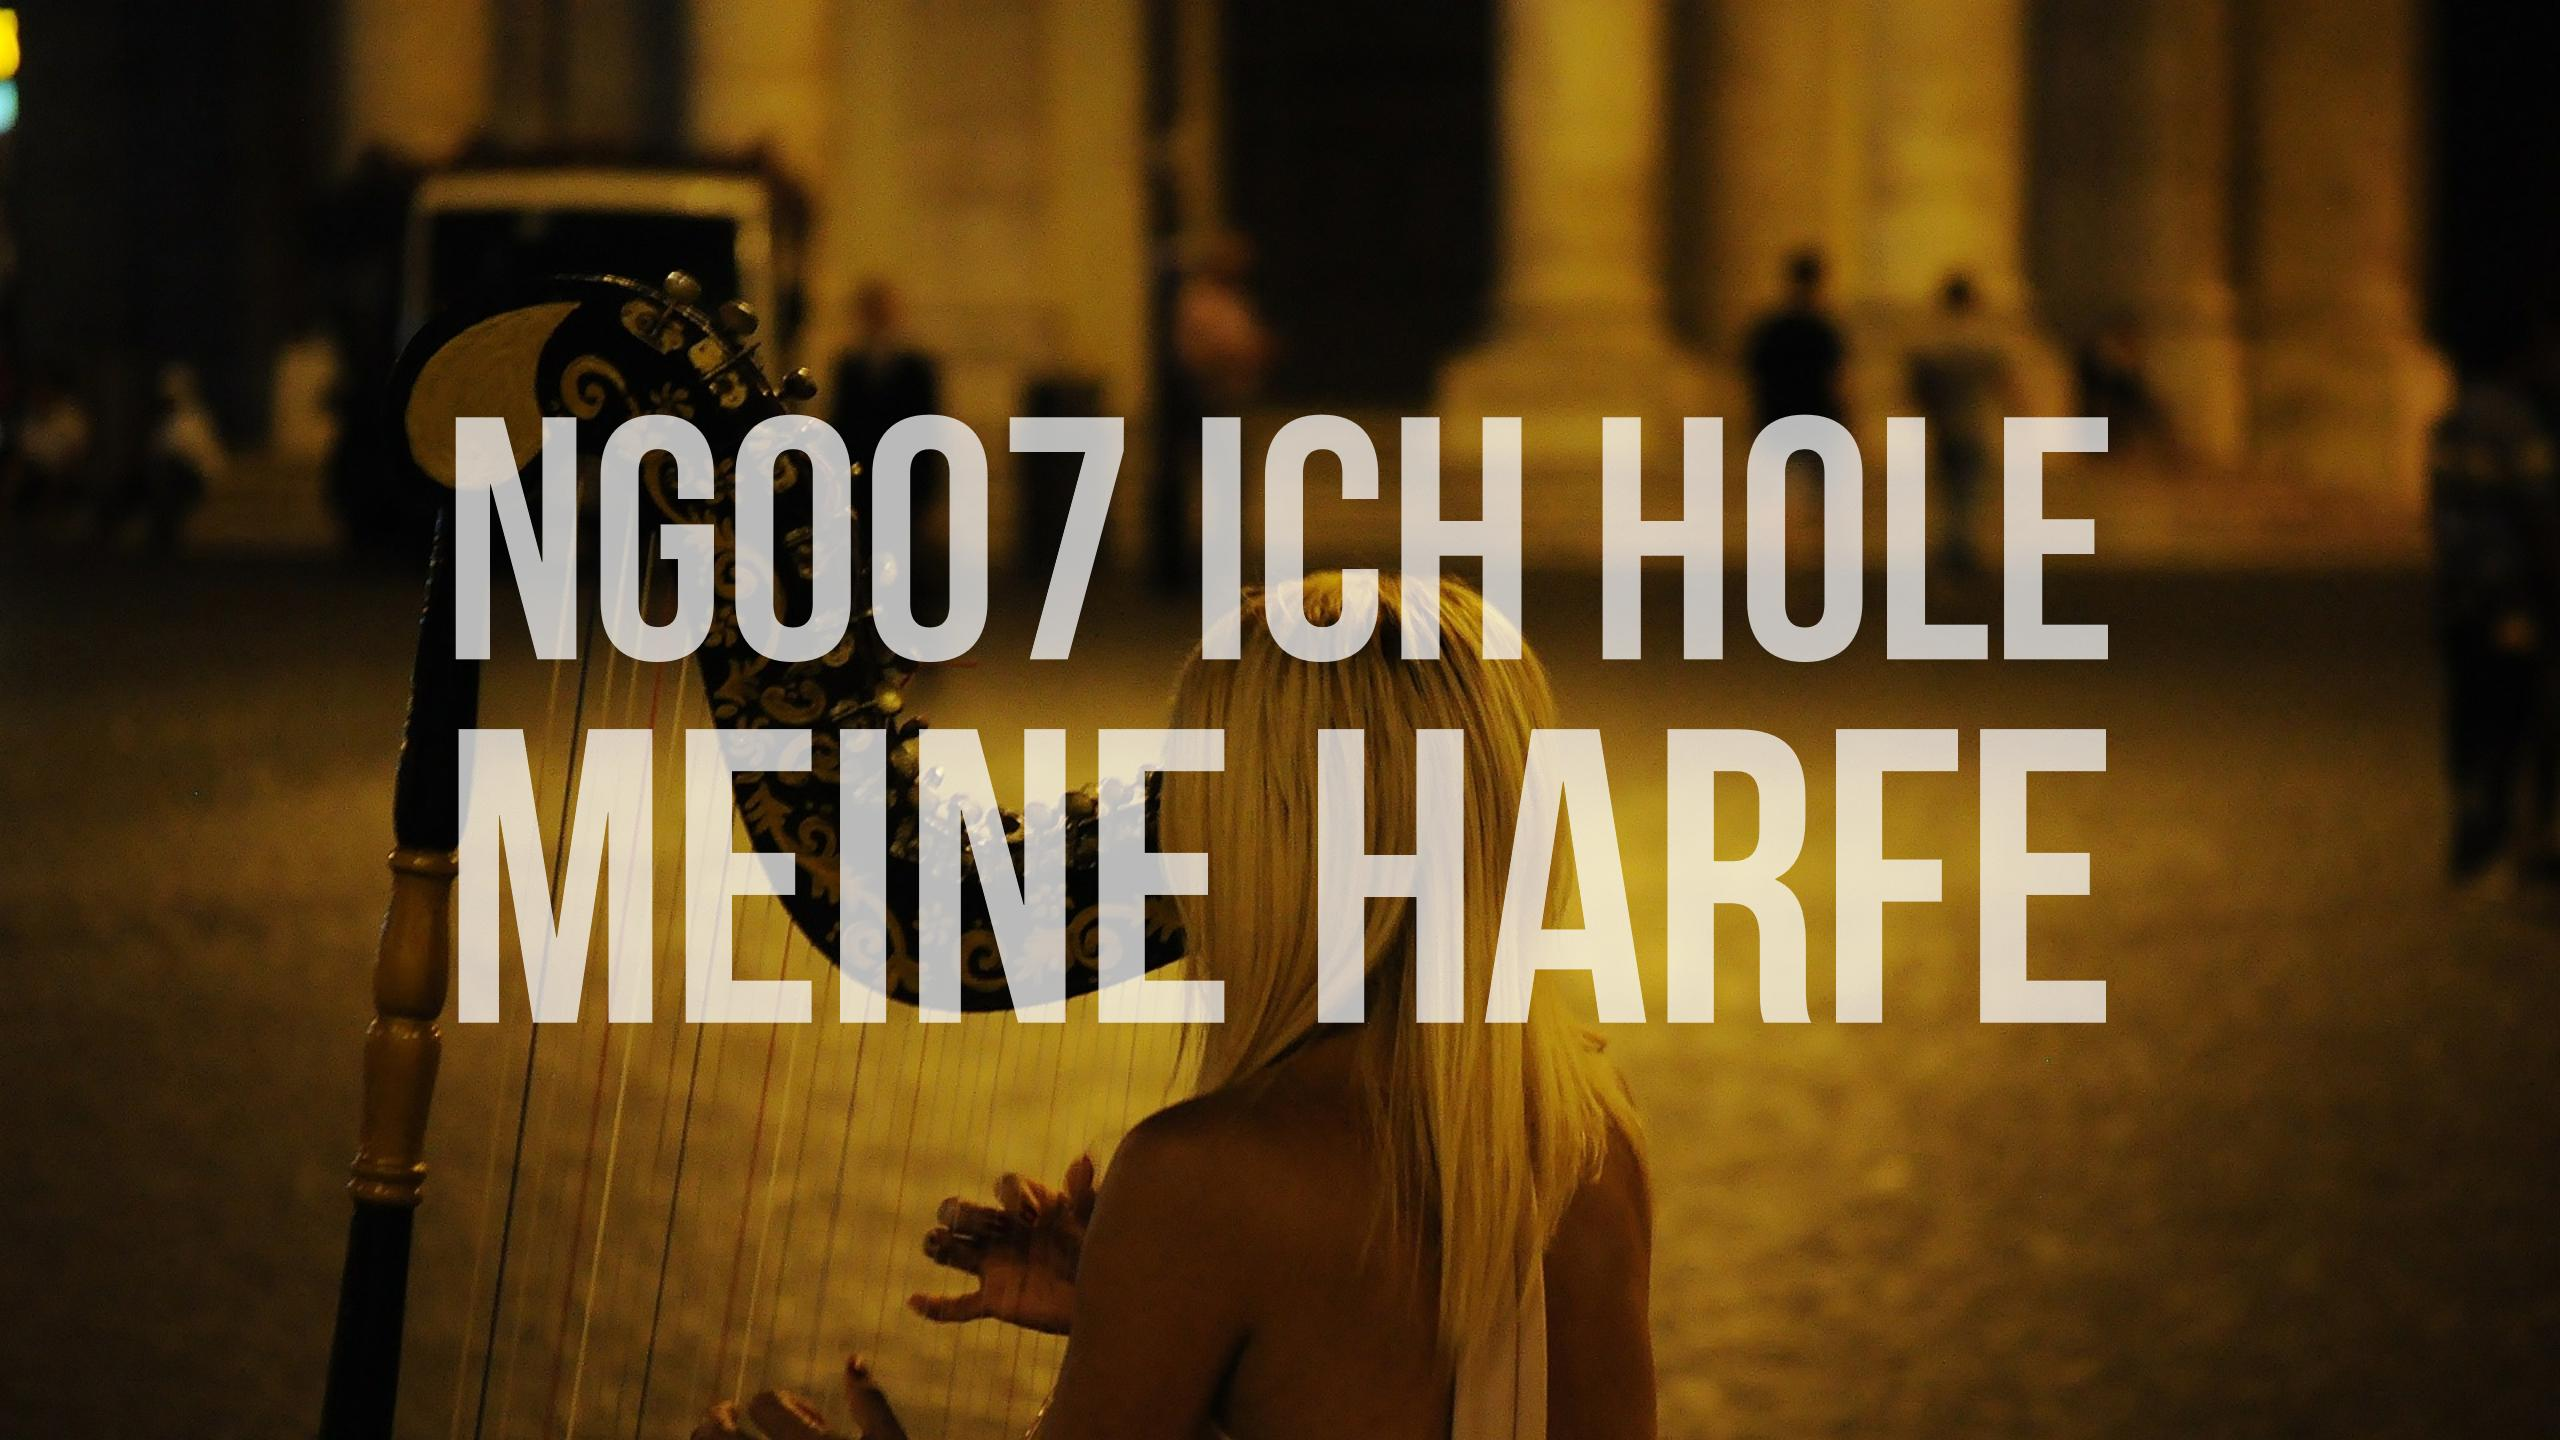 NG007 Ich hole meine Harfe